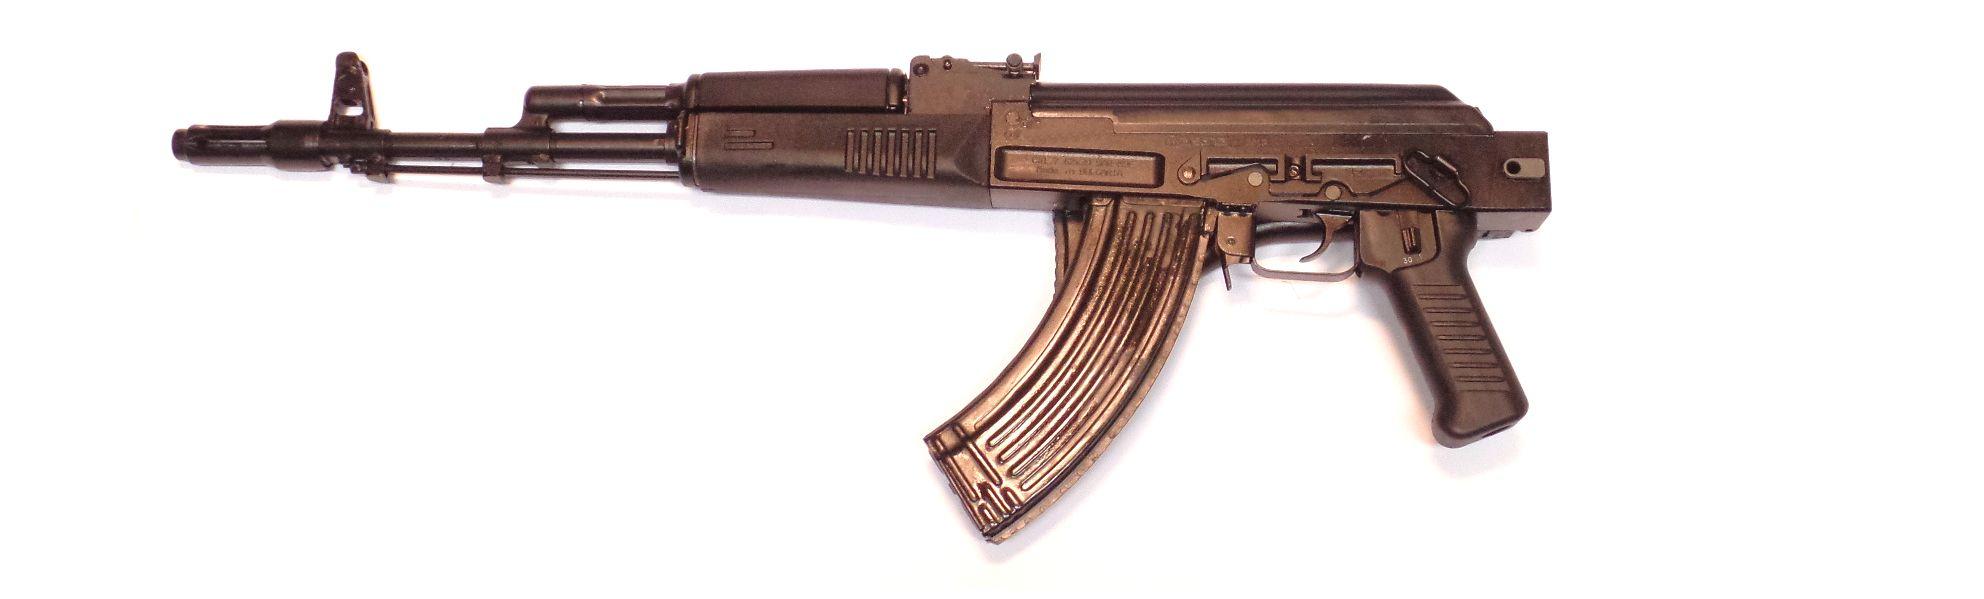 Arsenal AR-M9F Calibre 7,62x39mm